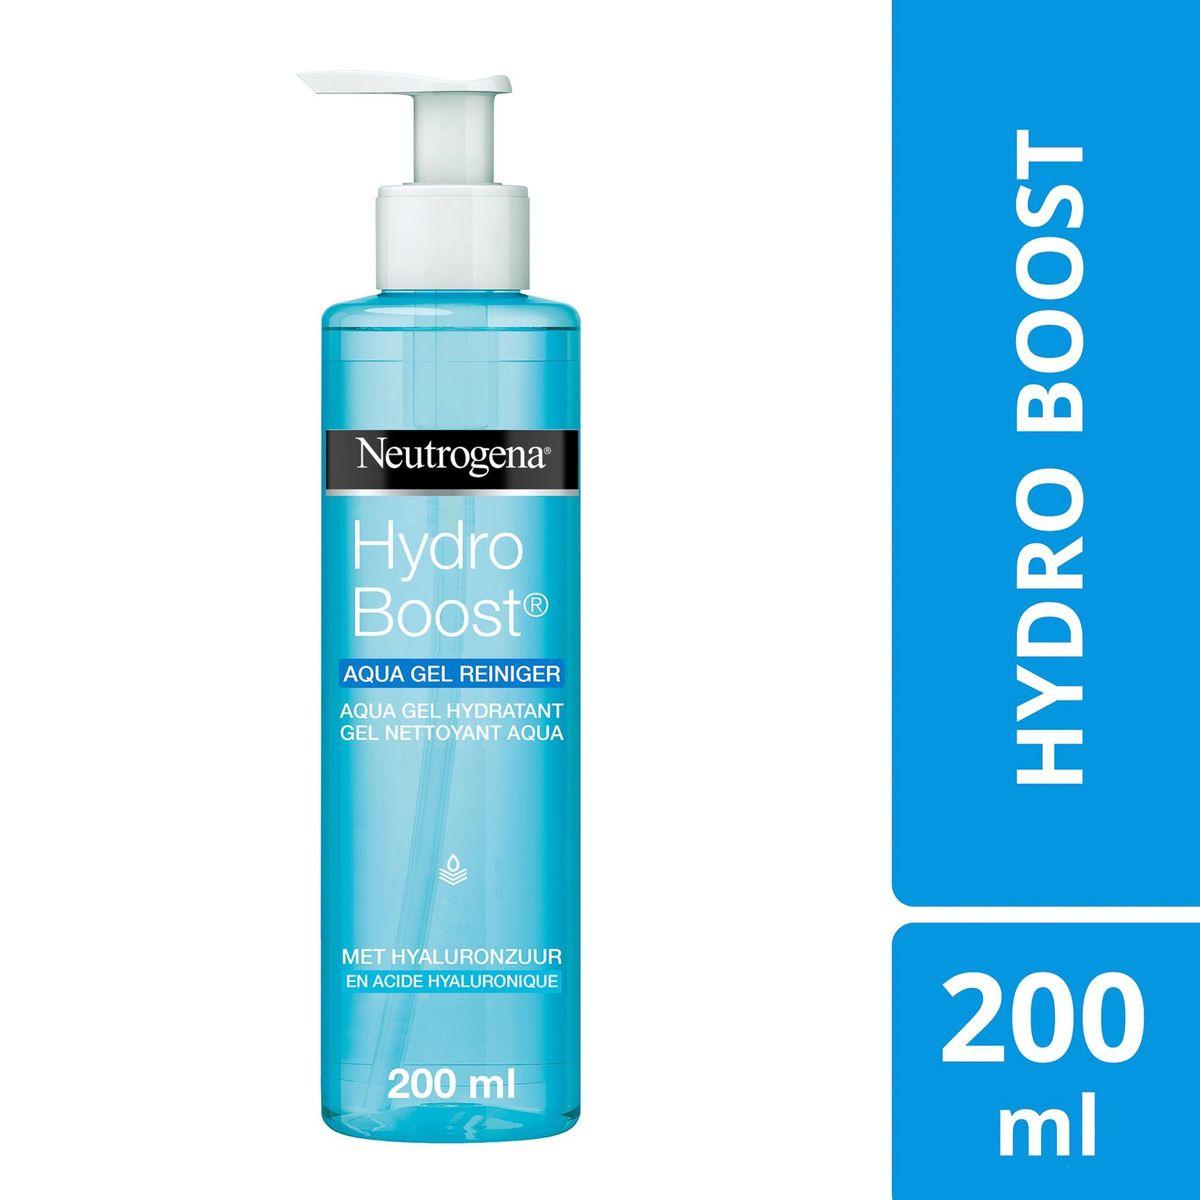 Neutrogena Hydro Boost Aqua Gel Reiniger 200 ml